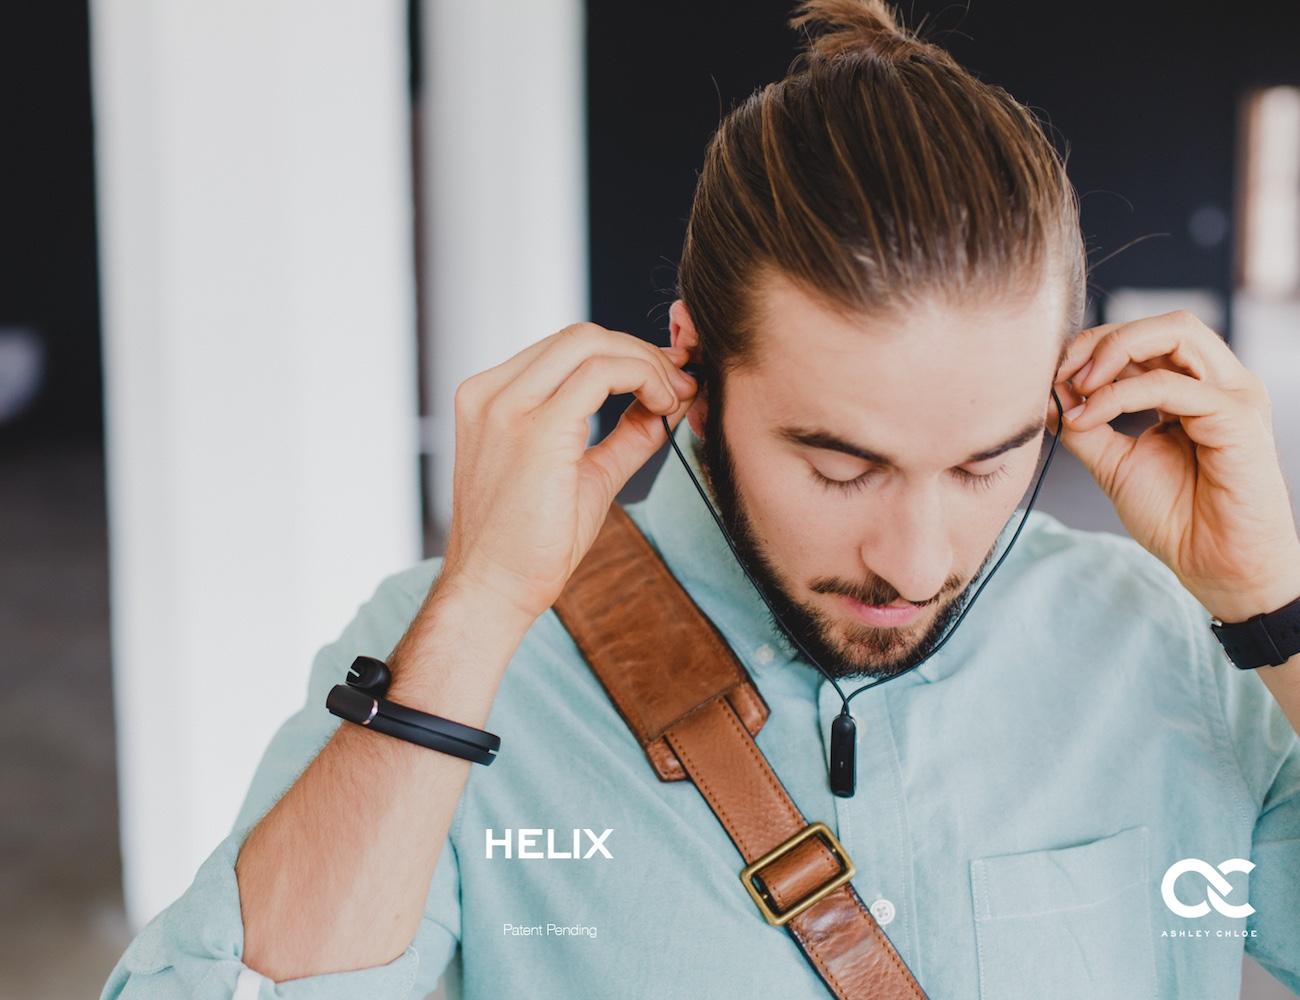 helix-cuff-03